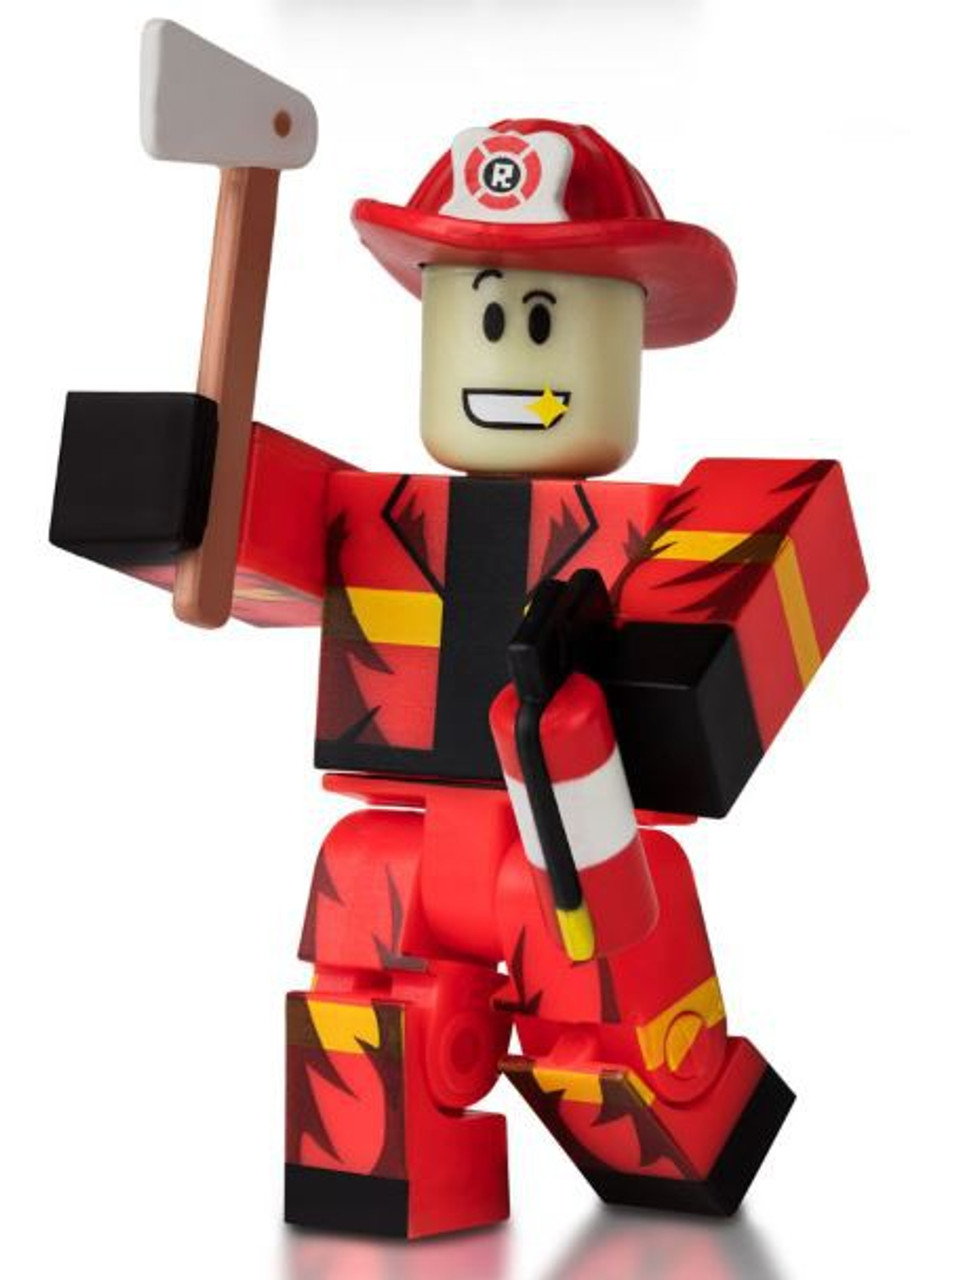 Roblox Westover Fire Dept Minifigure [No Code Loose]